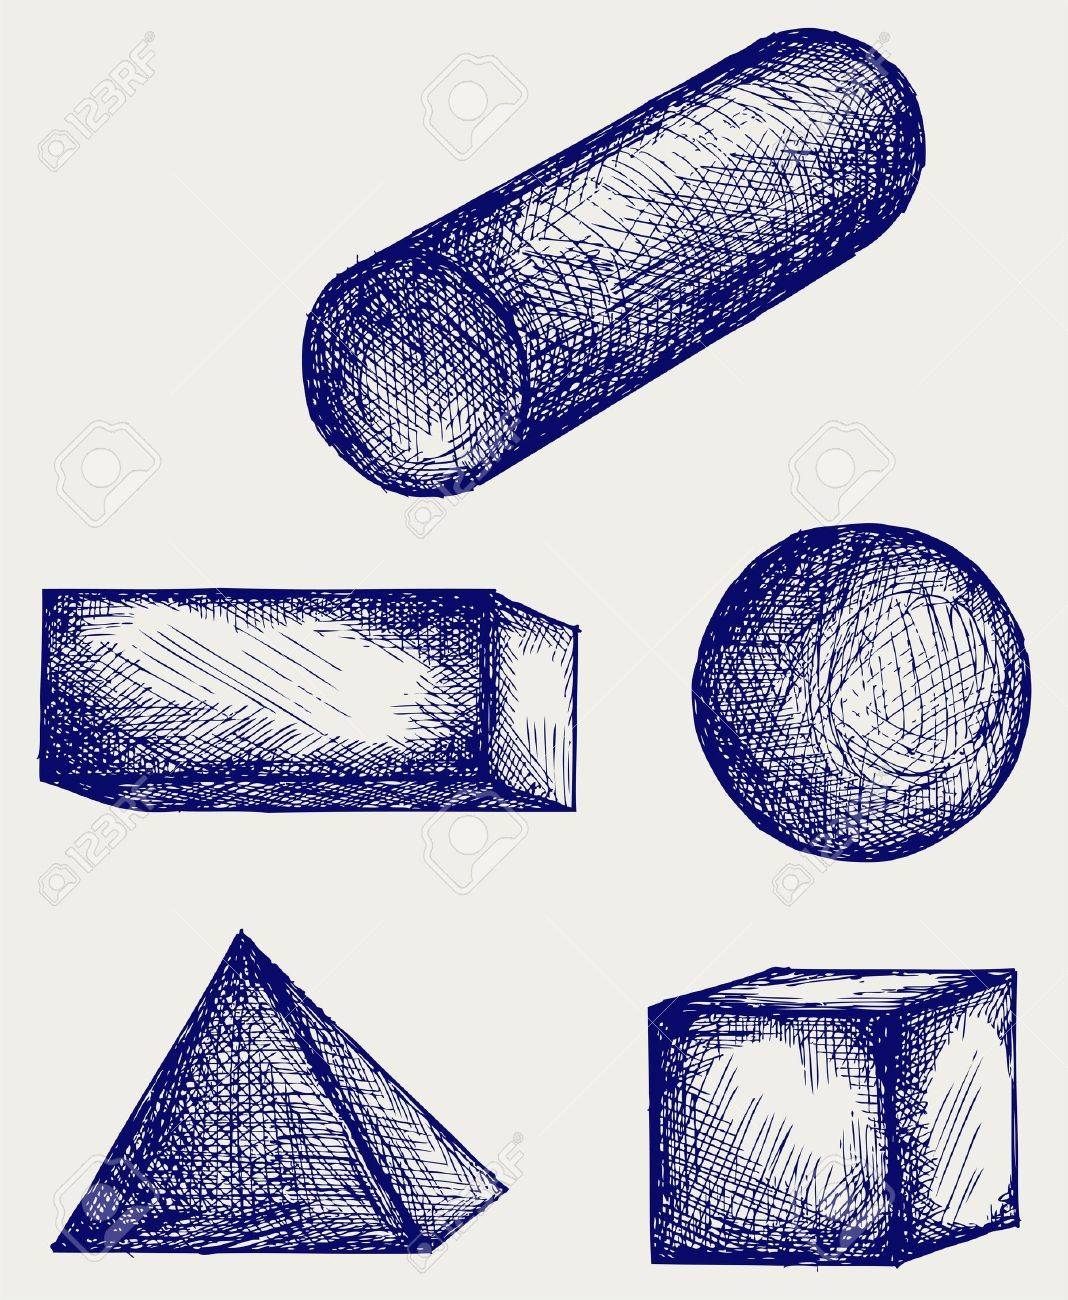 Geometry. Doodle style